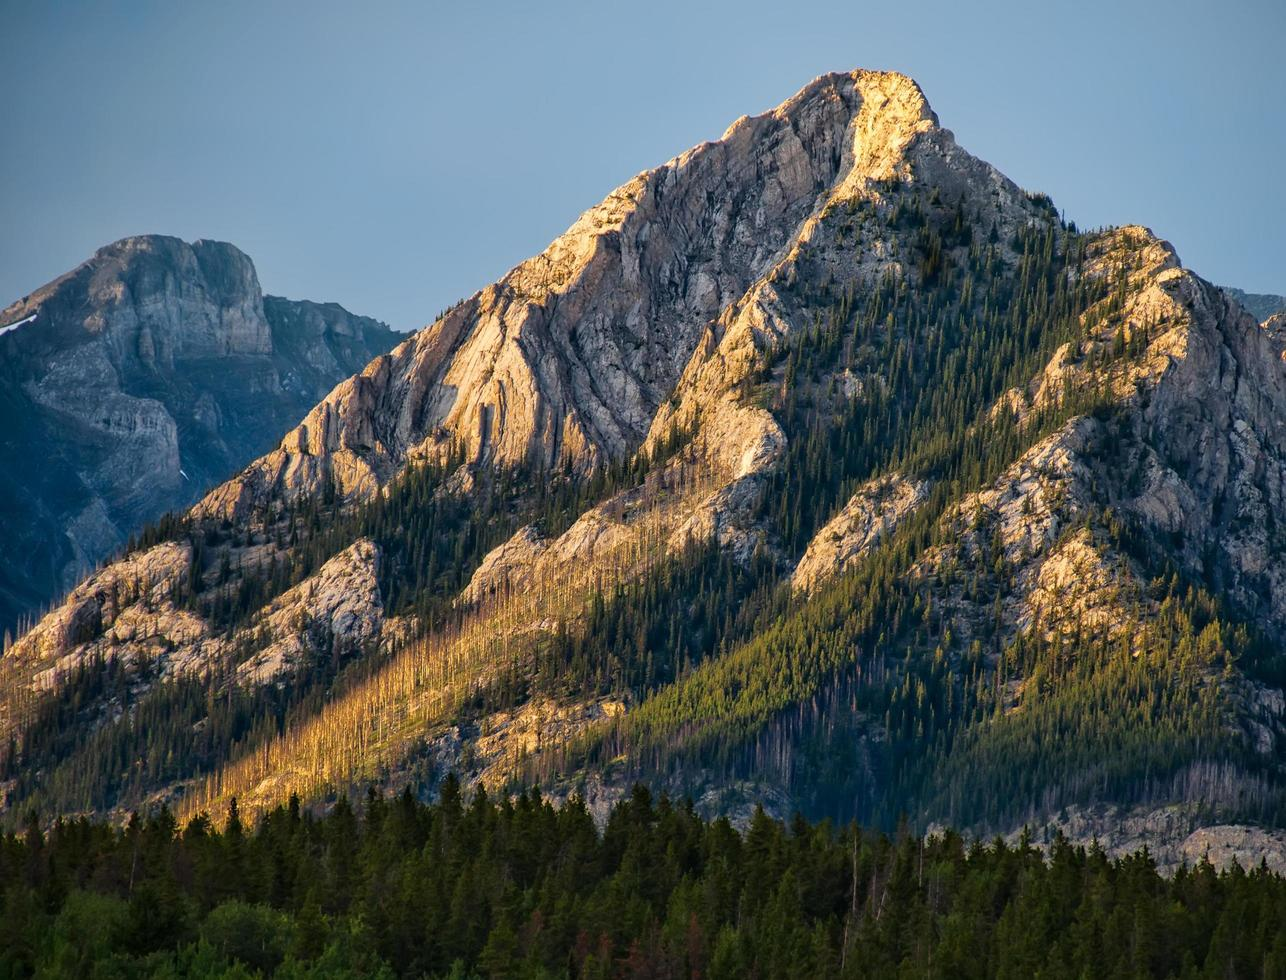 Rocky mountain landscape at sunset photo